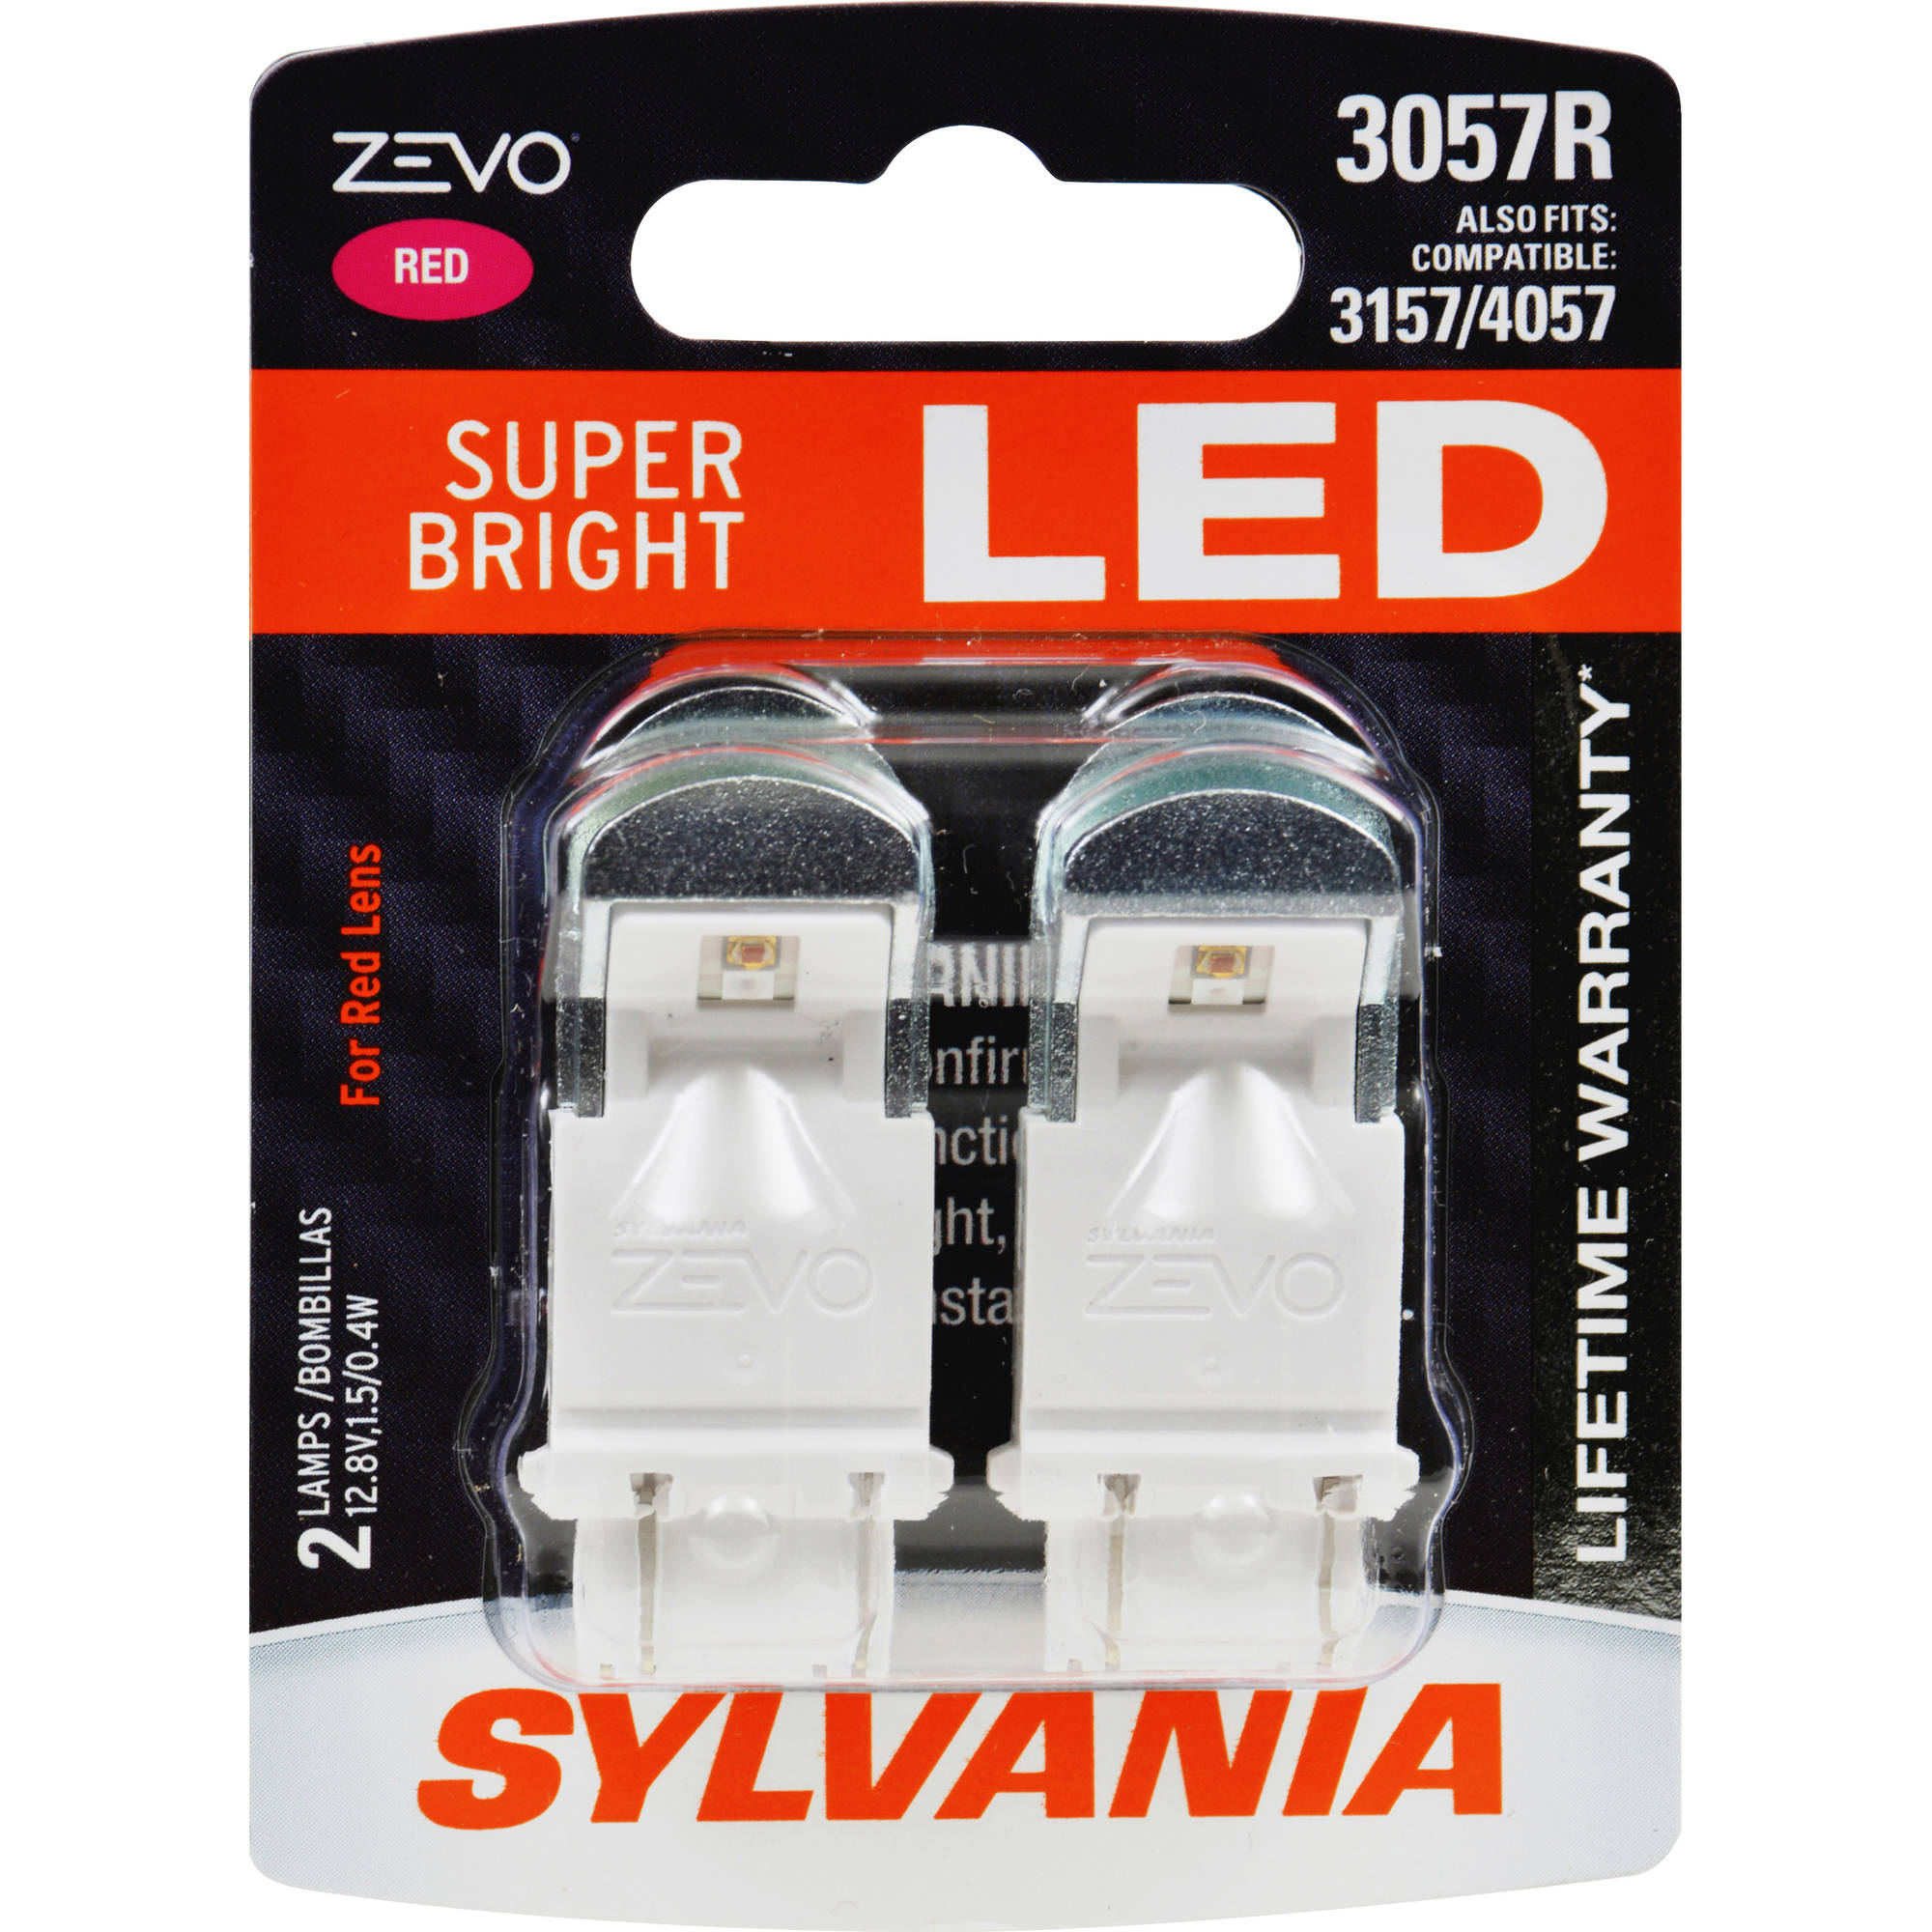 Sylvania 3057 ZEVO LED Bulb by Osram Sylvania Inc.